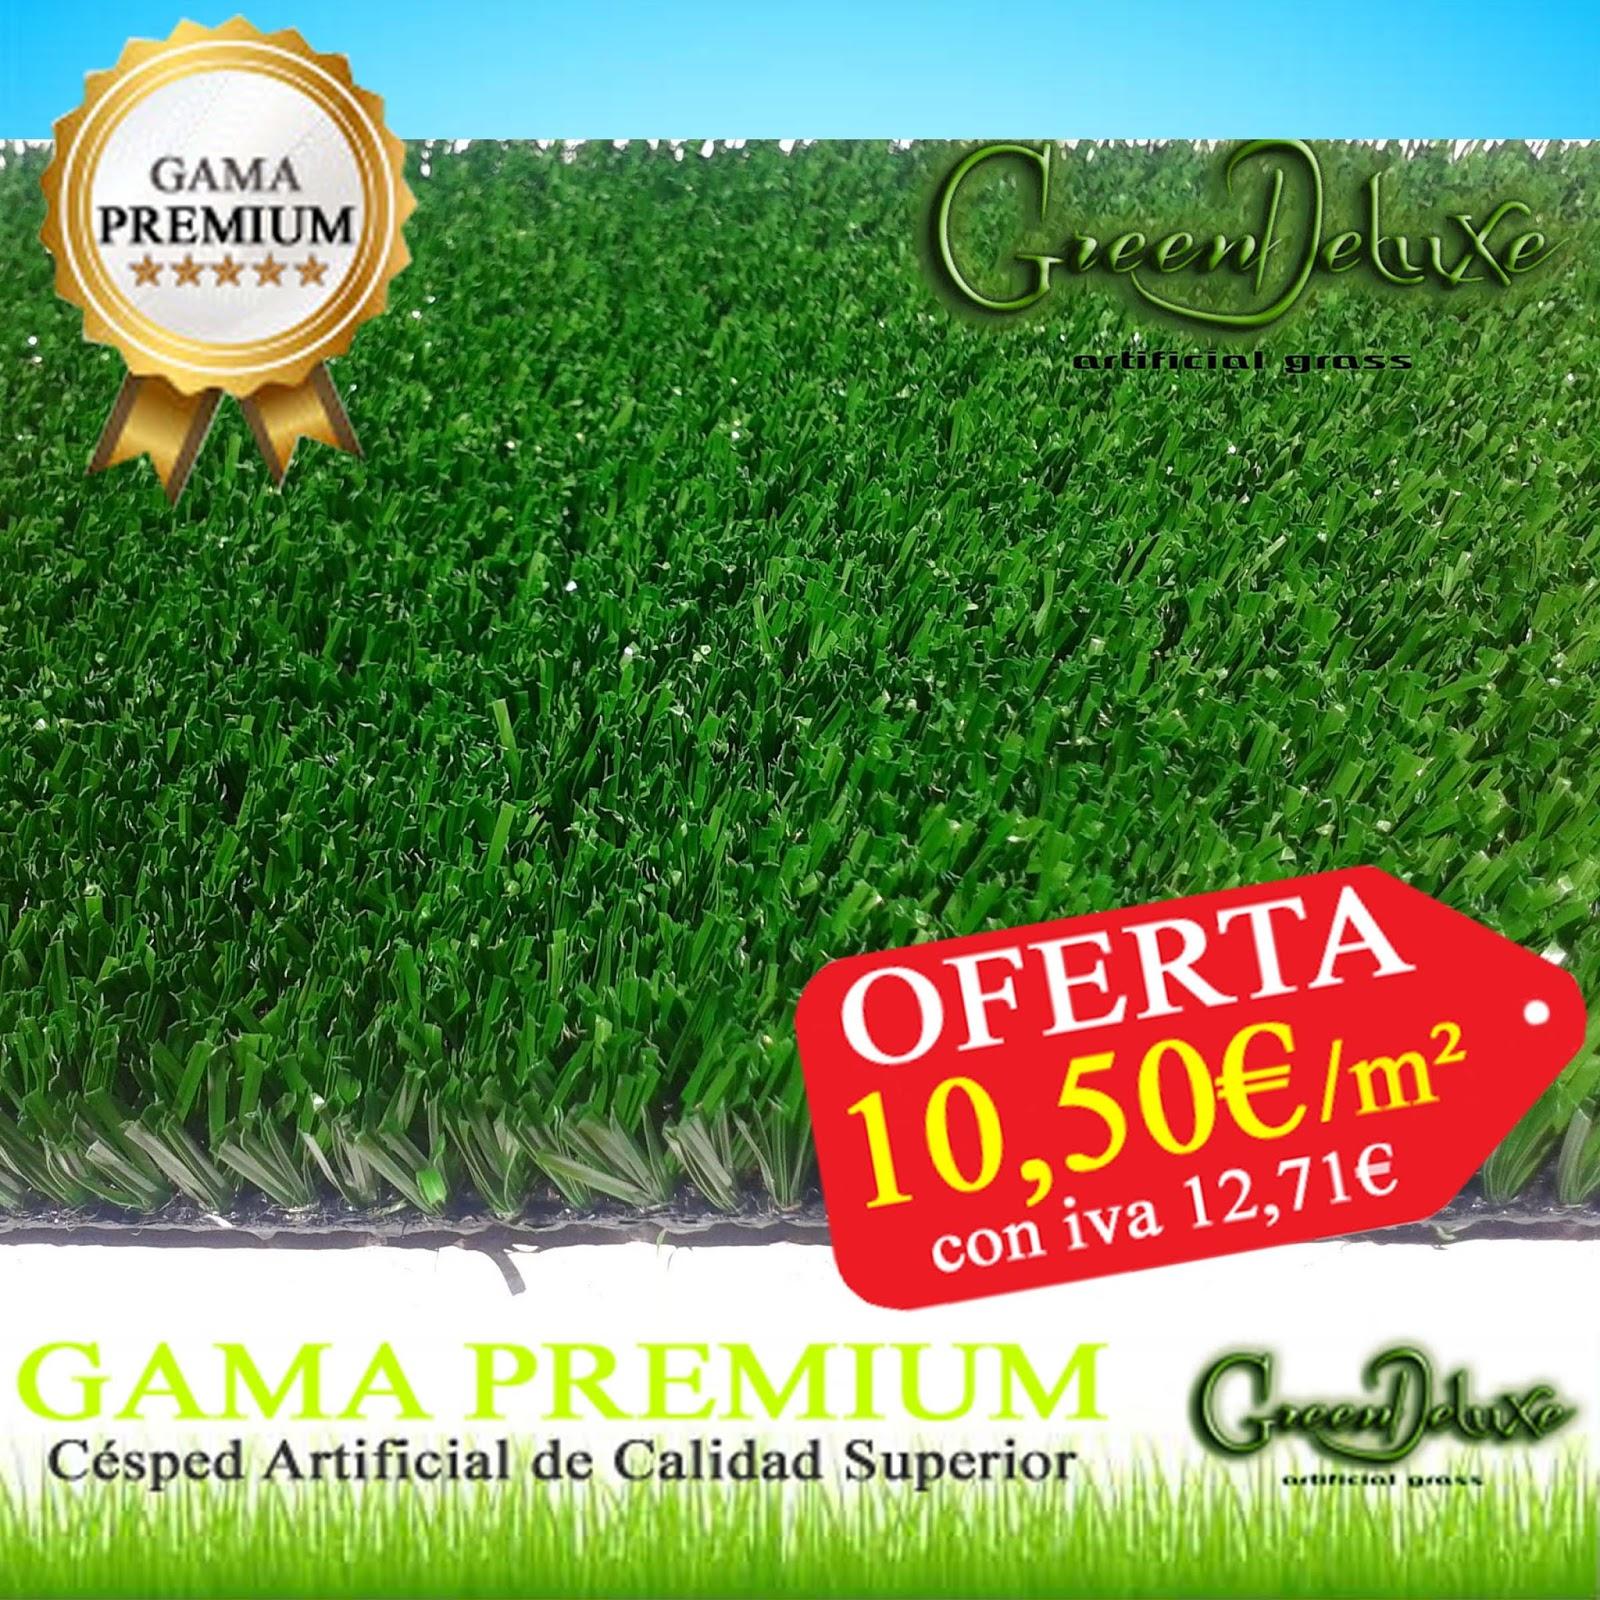 Ofertas c sped artificial barato 2015 - Cesped artificial oferta ...